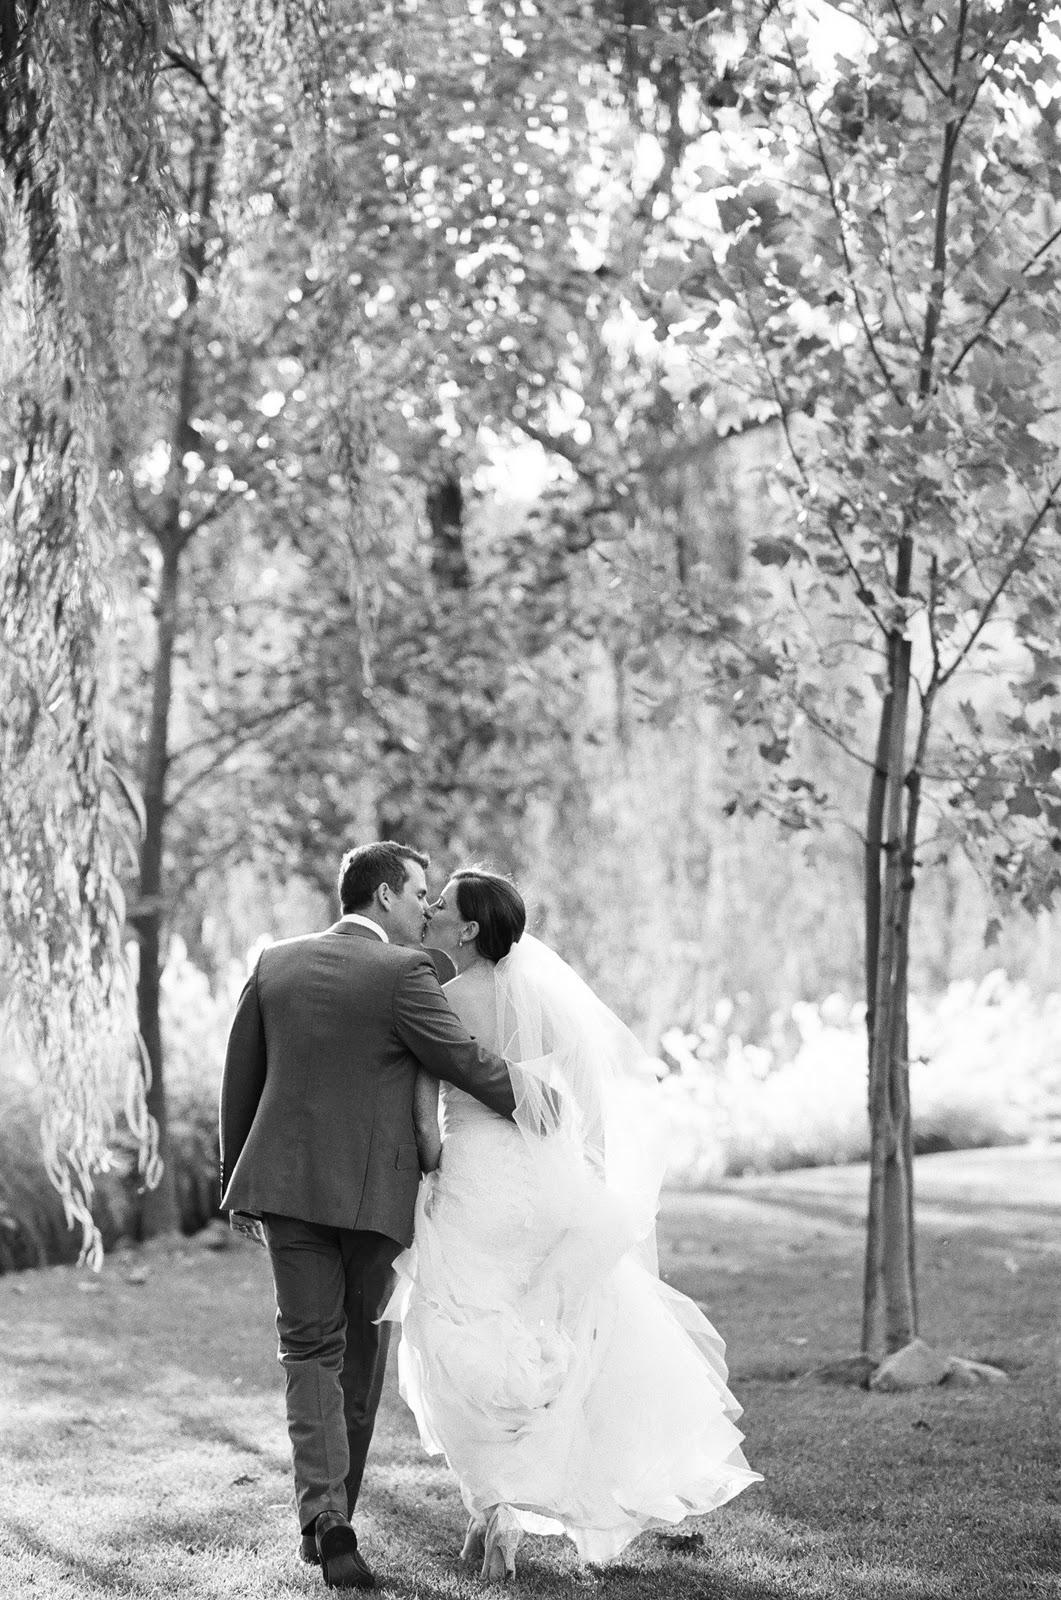 sylvie-gil-film-photography-wedding-bride-groom-black-white-swan-lake-napa